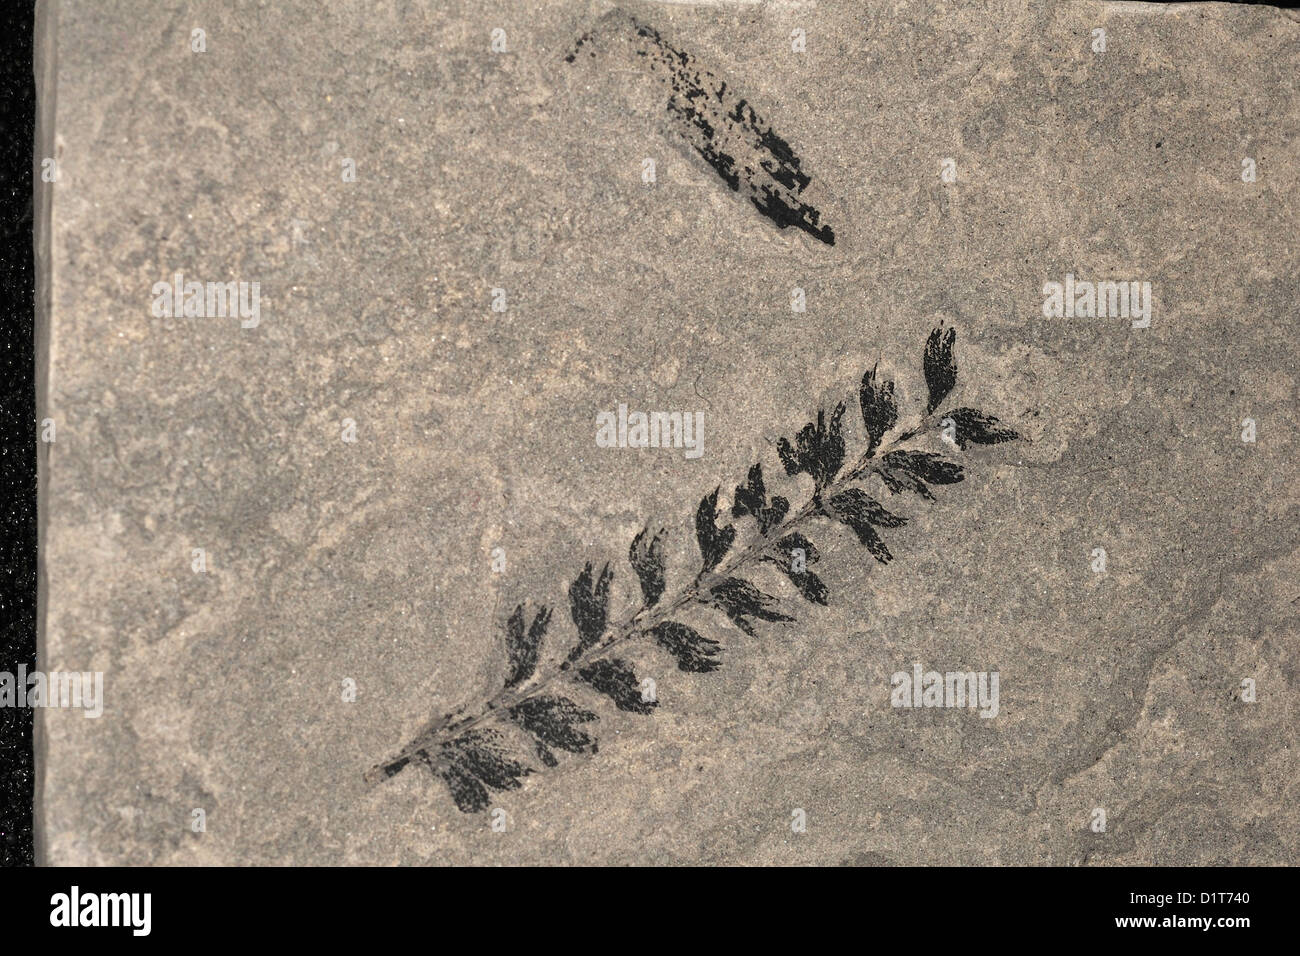 Fossil fern, Sphenophyllum longifolium, Plantae; Tracheophyta; Equisetales; Calamitaceae; Usa - Stock Image